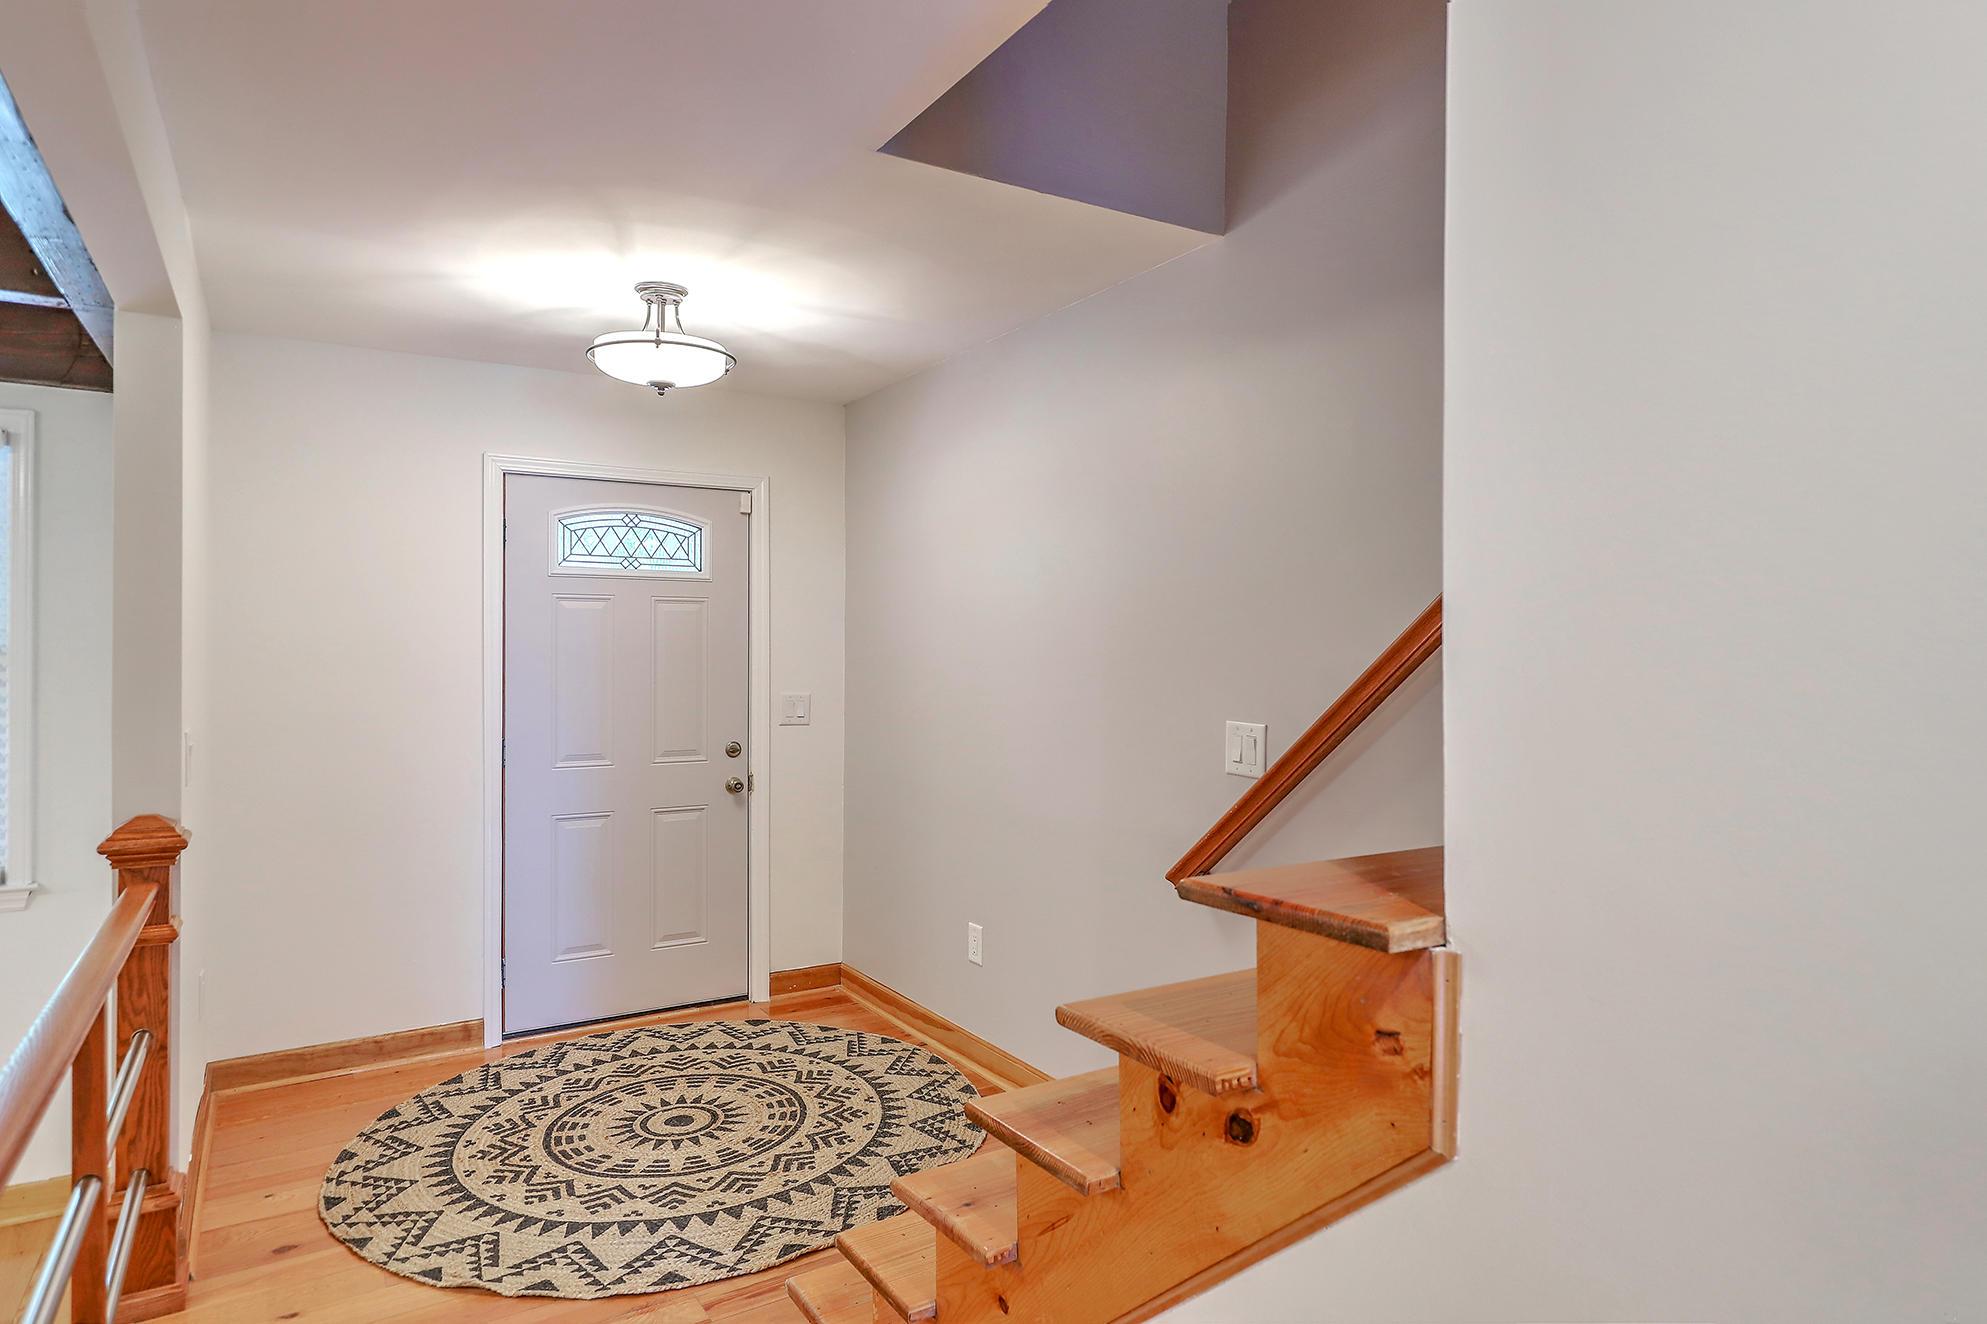 Edgewater Park Homes For Sale - 1413 Edsent, Charleston, SC - 3